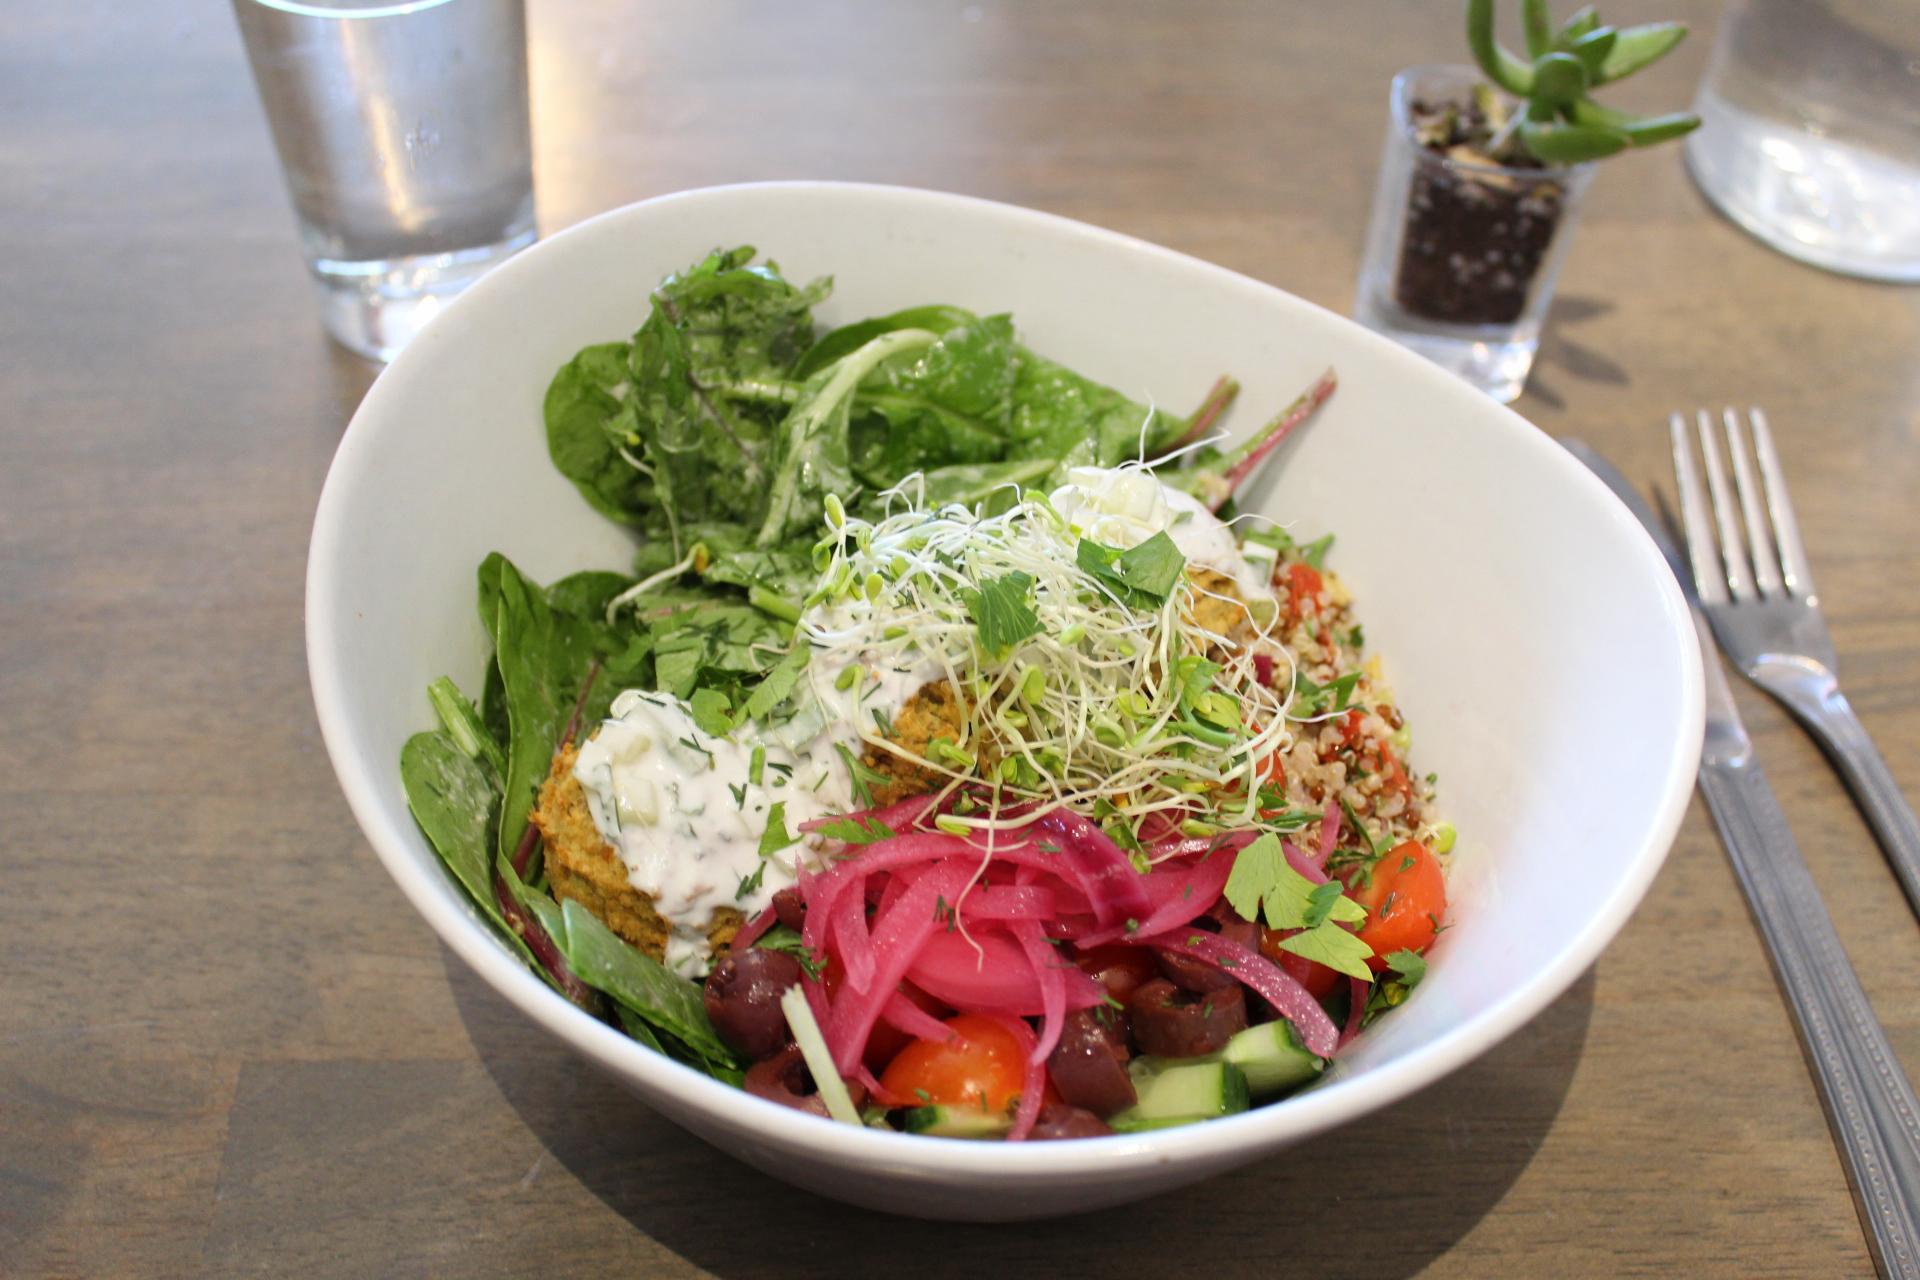 My-favorite-vegan-restaurants-in-orlando-fabulouslyoverdressed